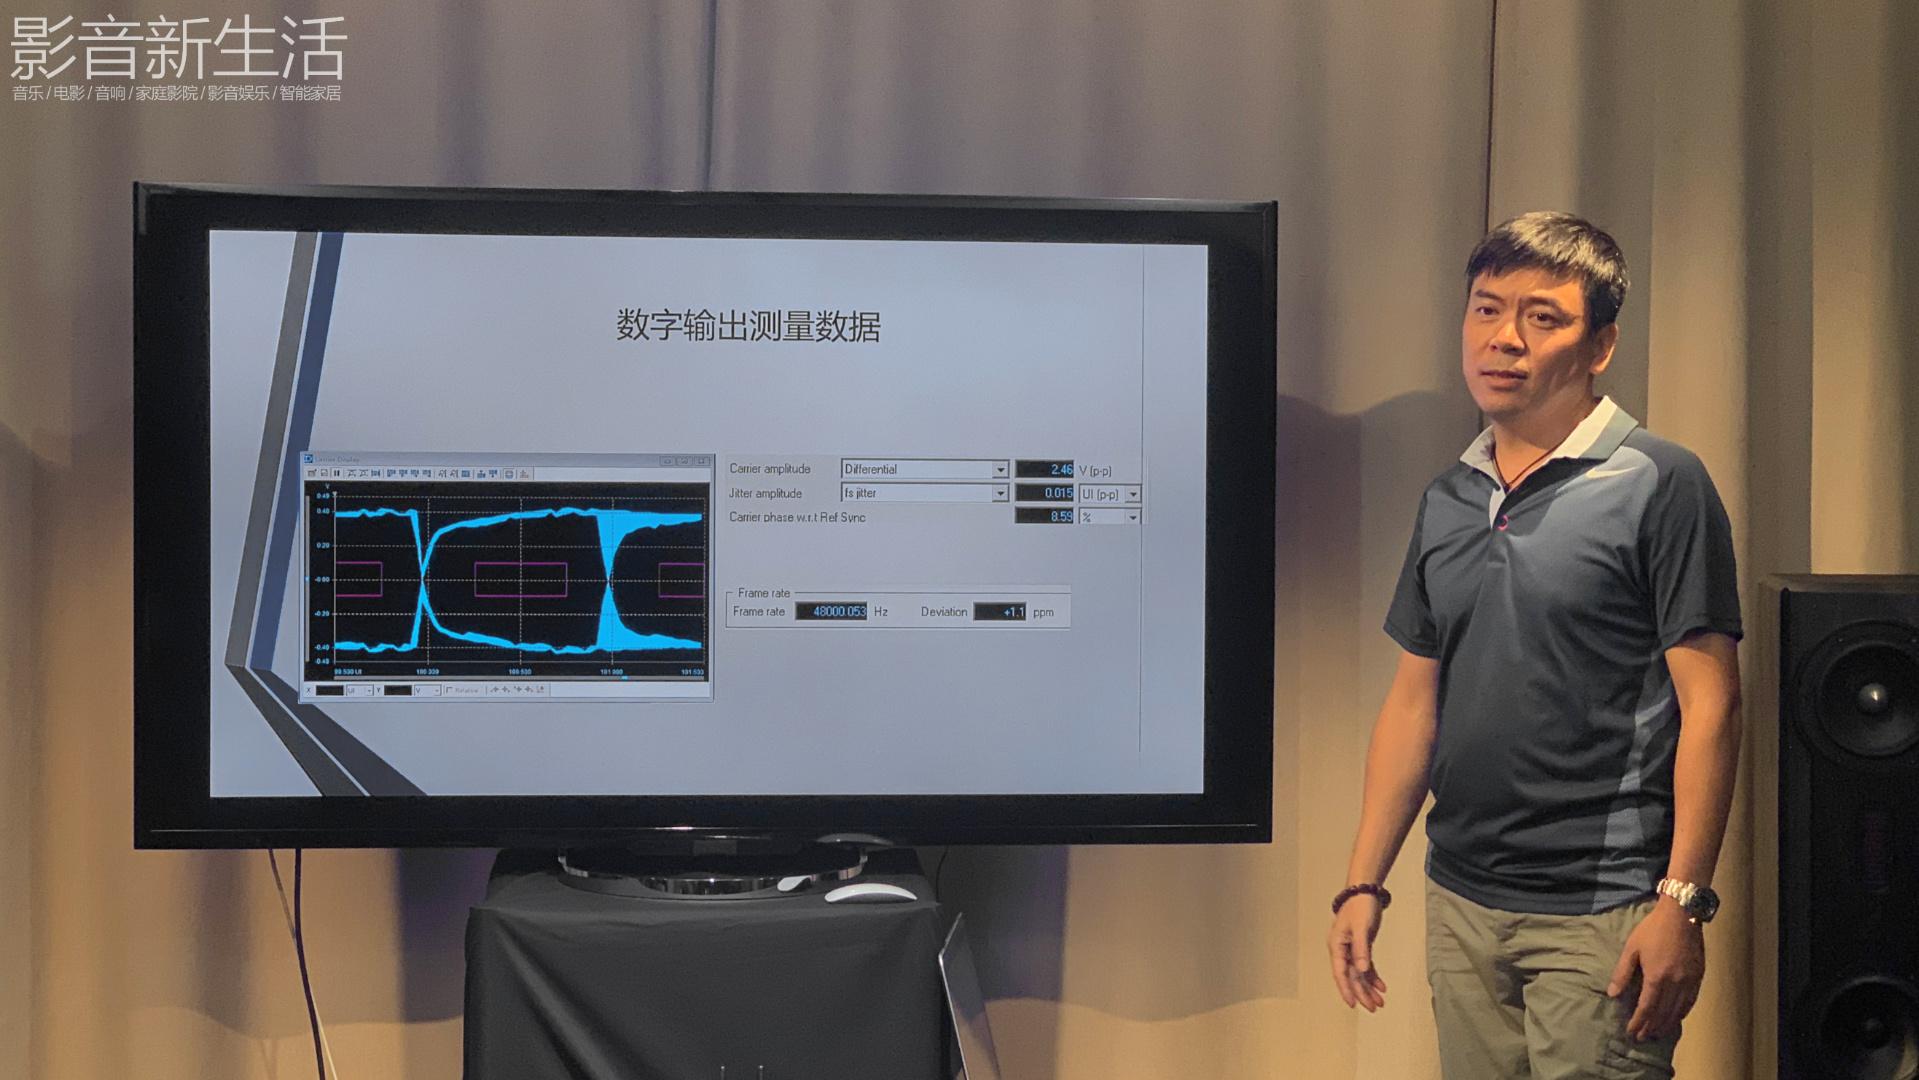 Pureaudio AirDSD HIFI 24 - 新品   2018柏韵10周年纪念产品:Pureaudio AirDSD音频流播放解码器发布!